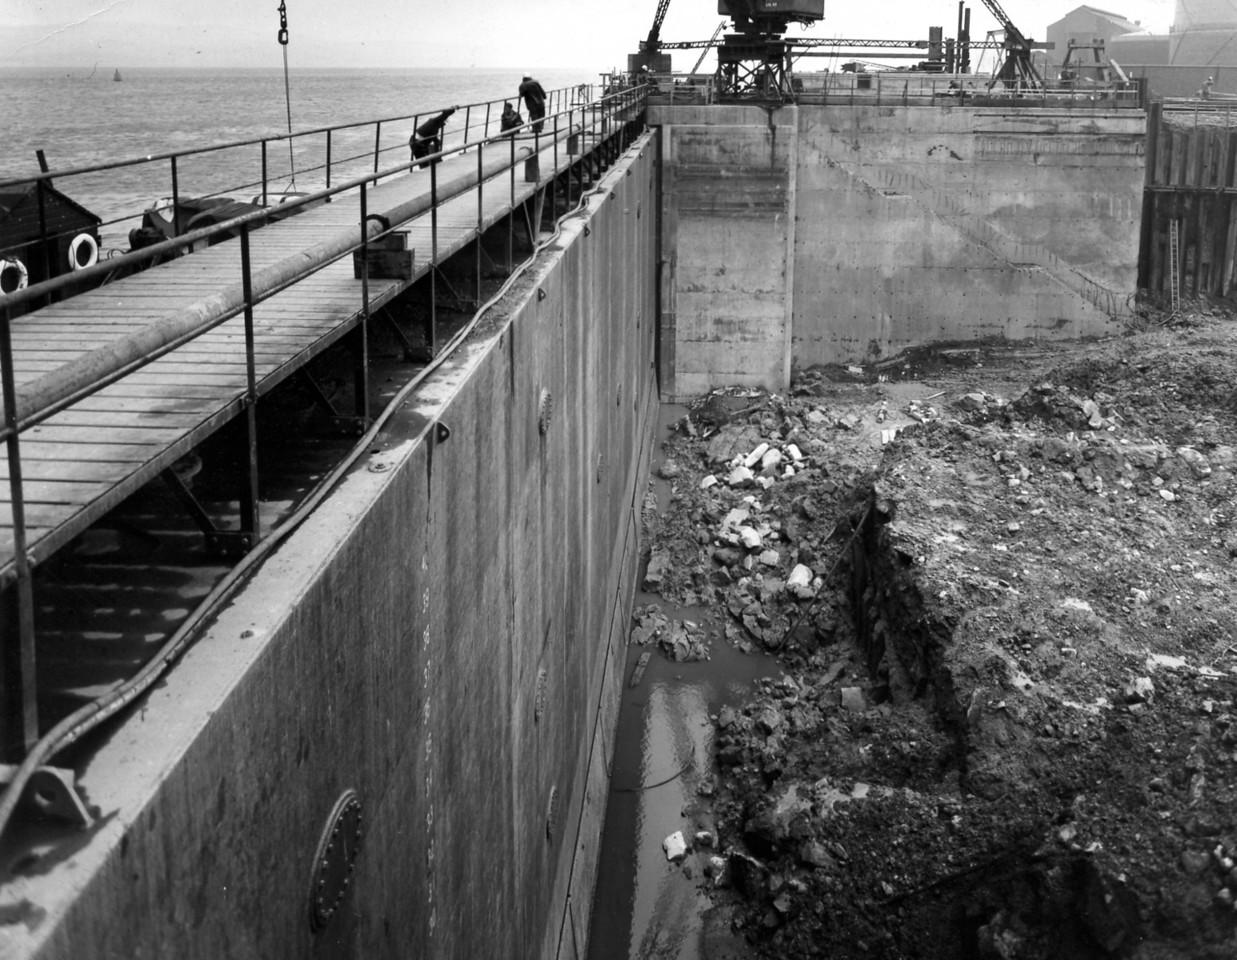 D109Excavation in progress behind cill  1/10/1963